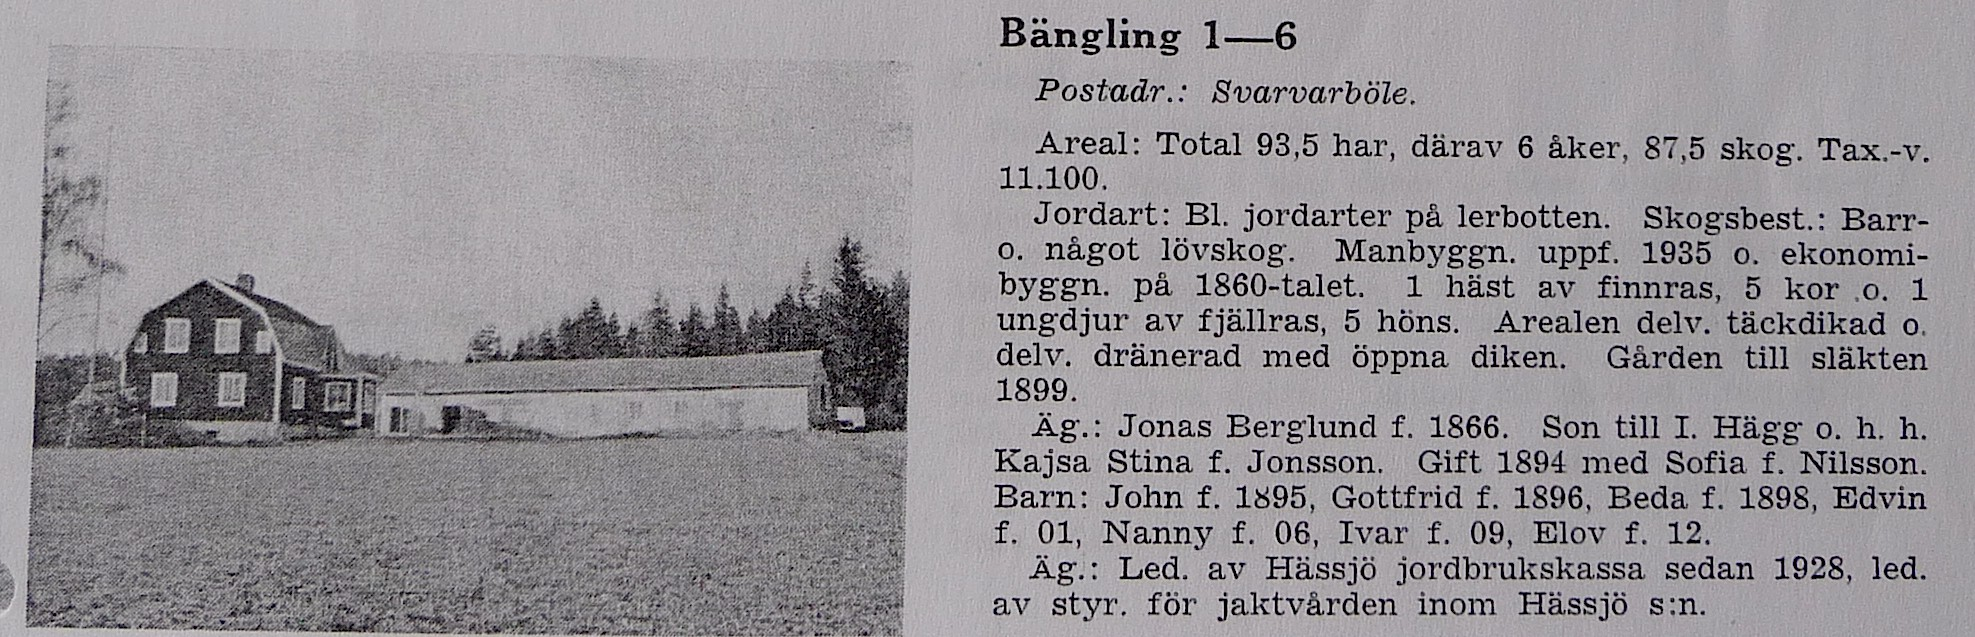 - 1866_Jonas_Berglund_Bangling